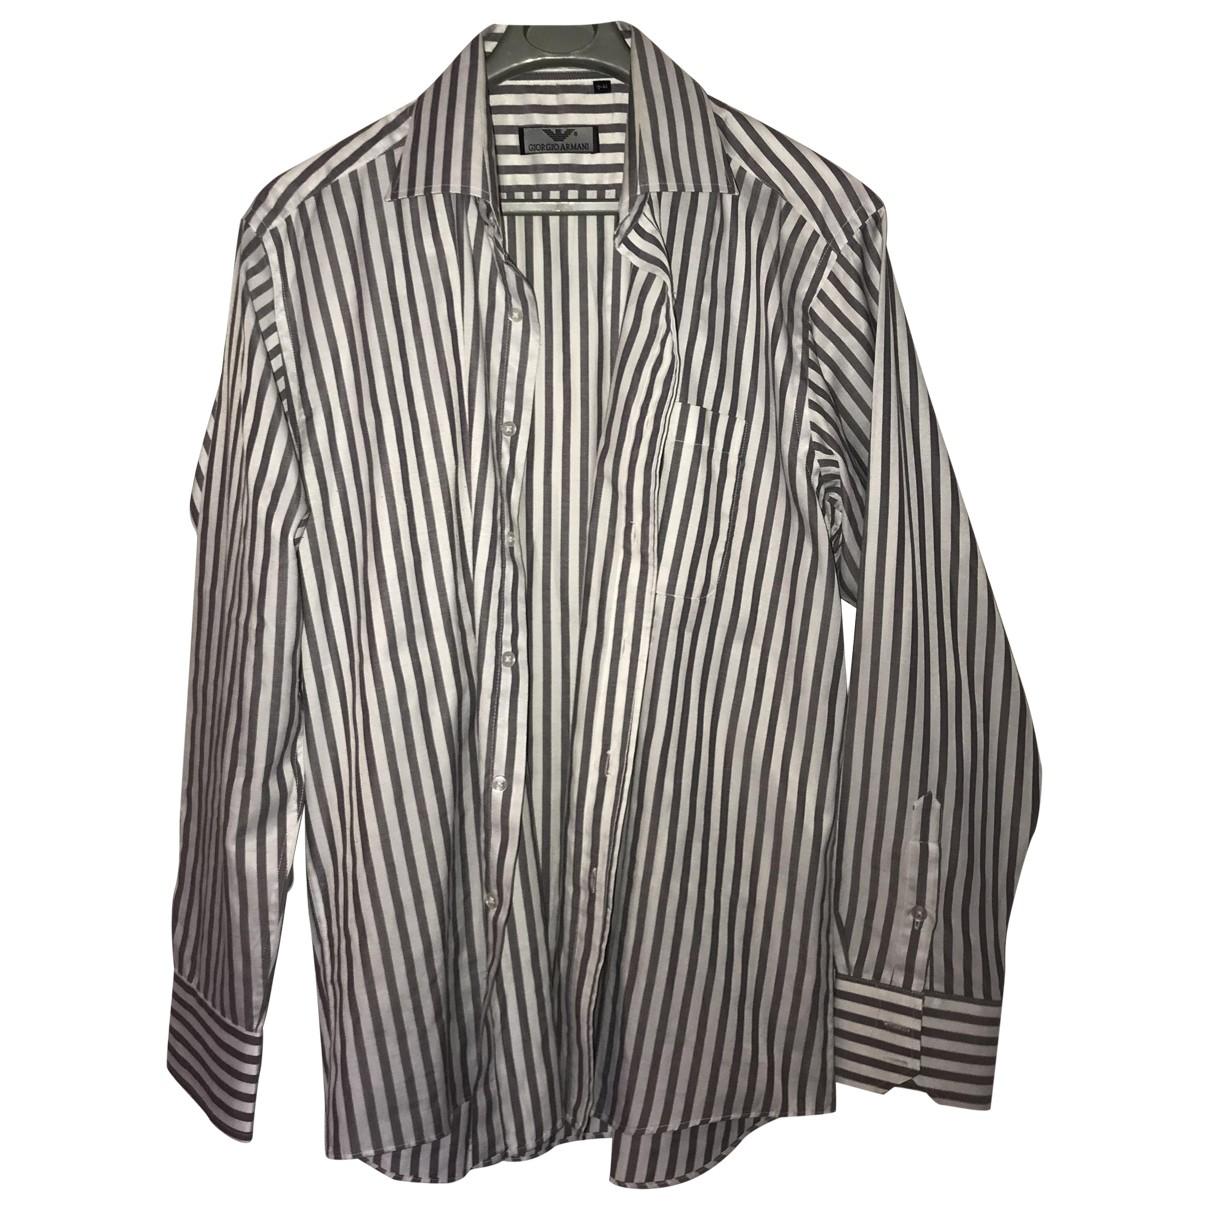 Giorgio Armani \N White Cotton Shirts for Men M International